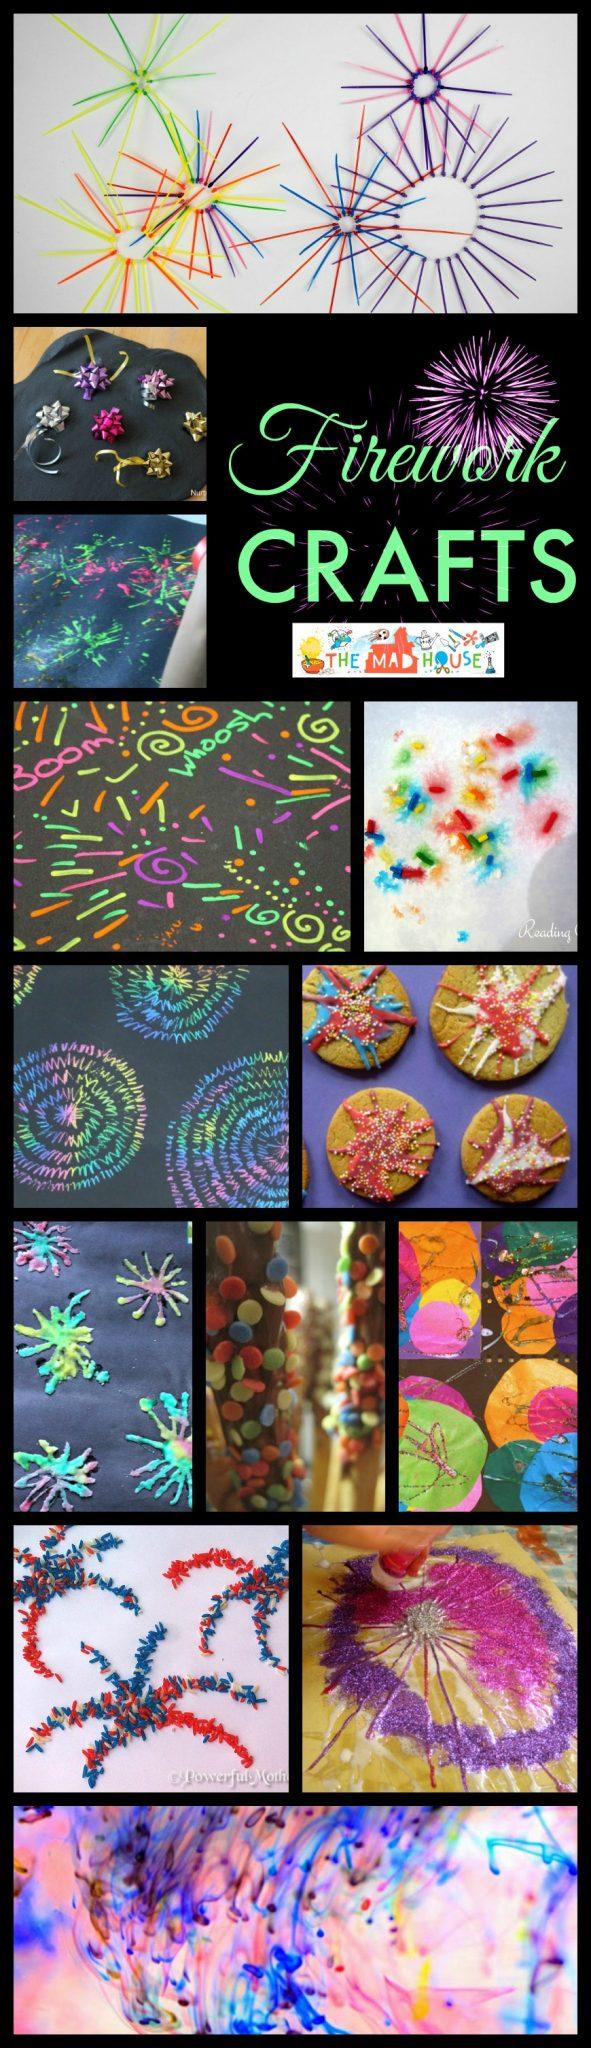 Firework crafts and treats roundup